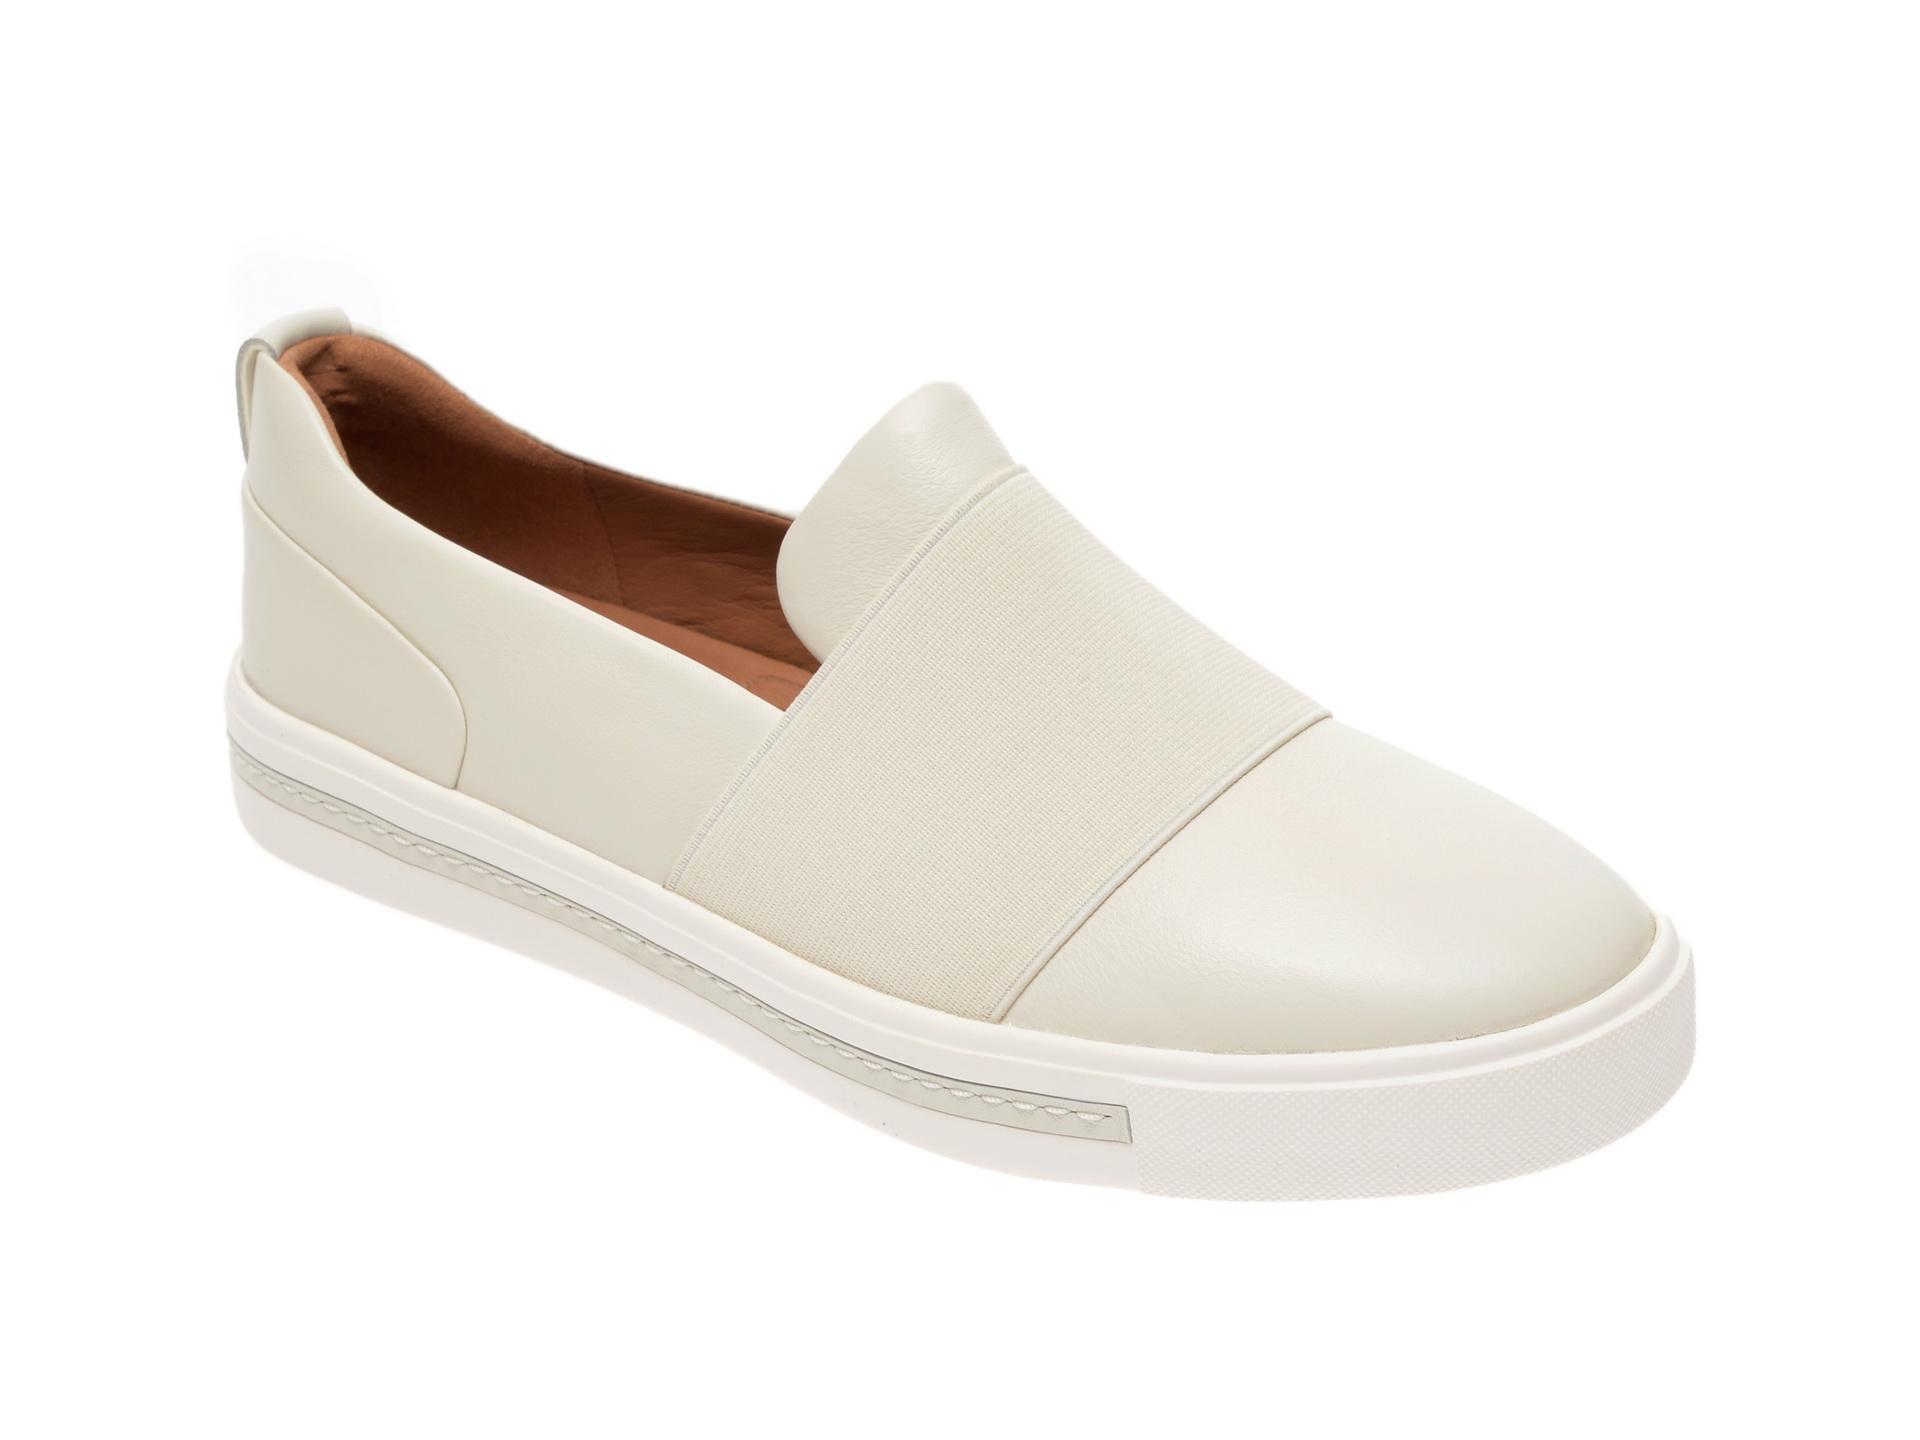 Pantofi CLARKS albi, Un Maui Strap, din piele naturala New